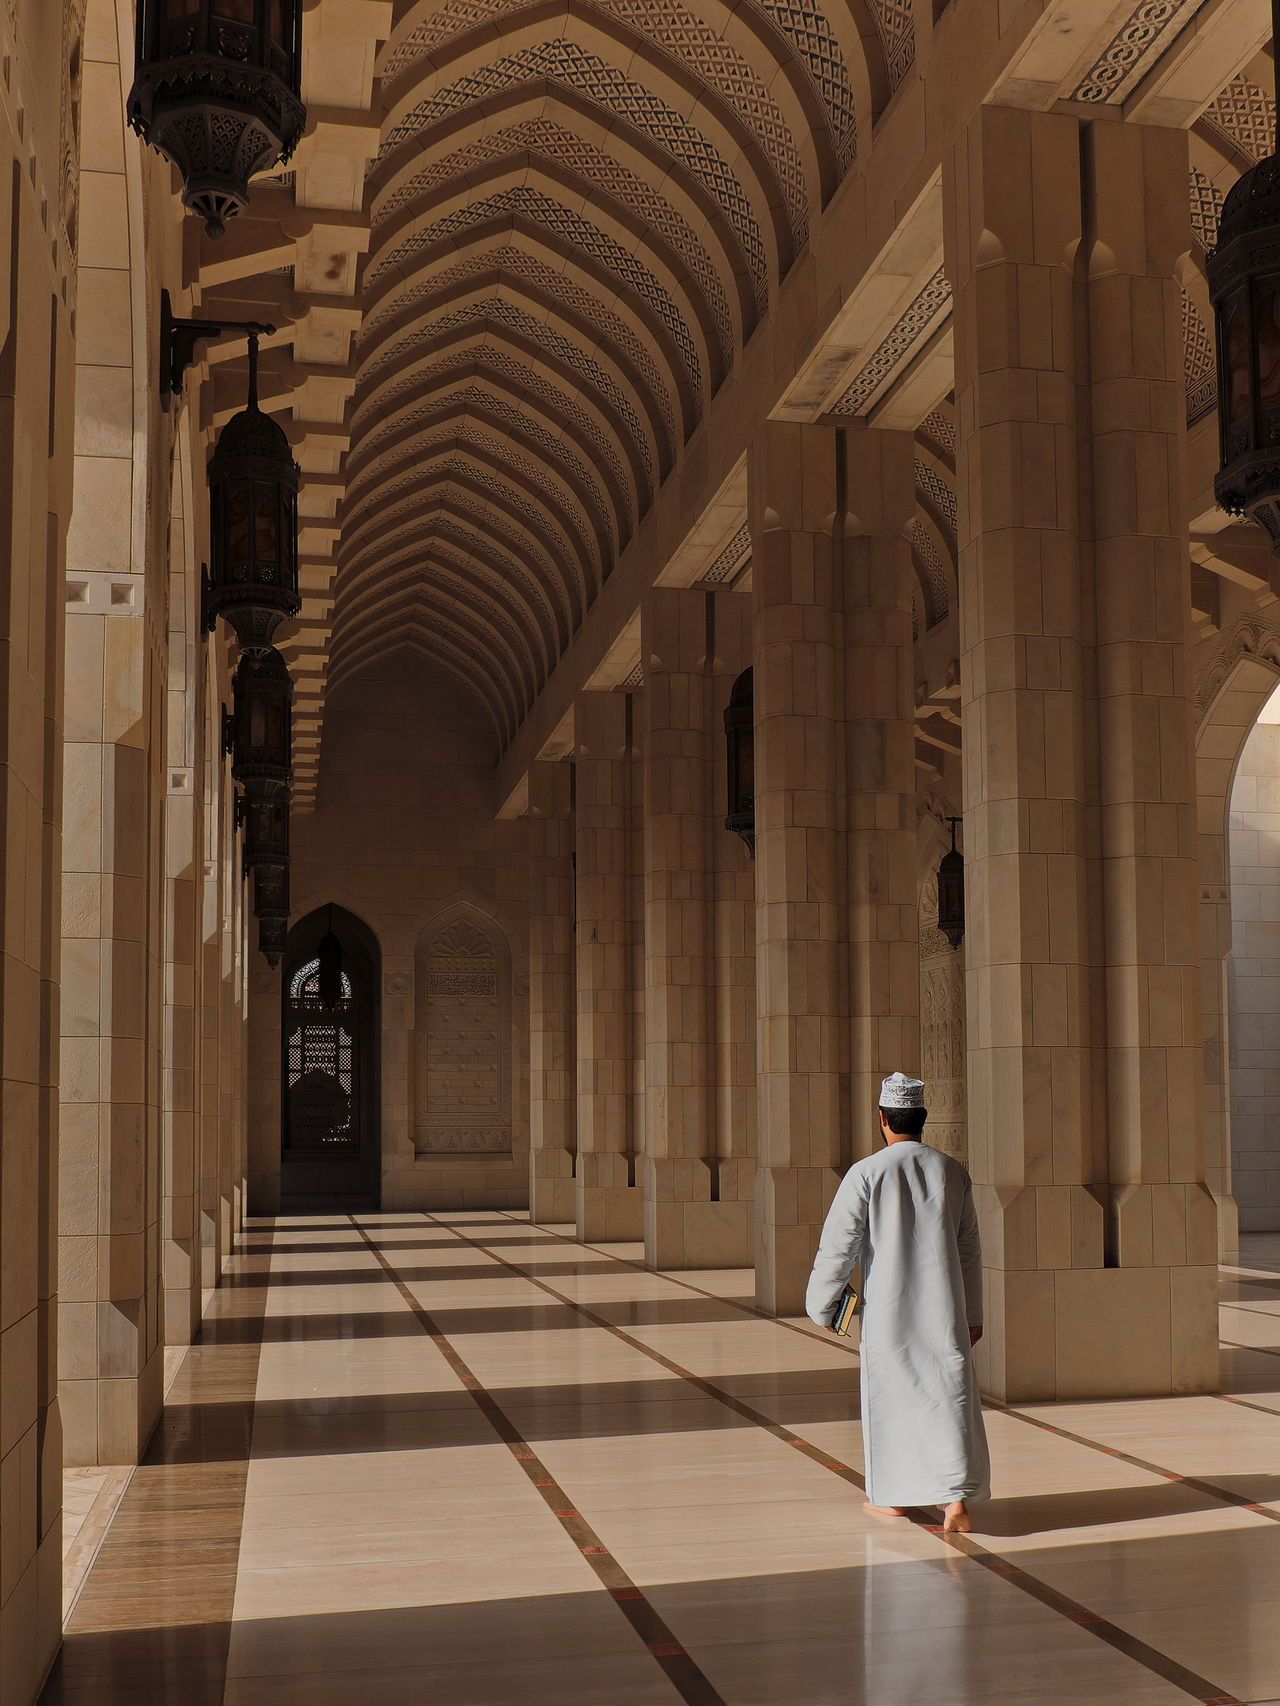 Architectural Column,  Architecture,  Built Structure,  Colonnade,  Corridor